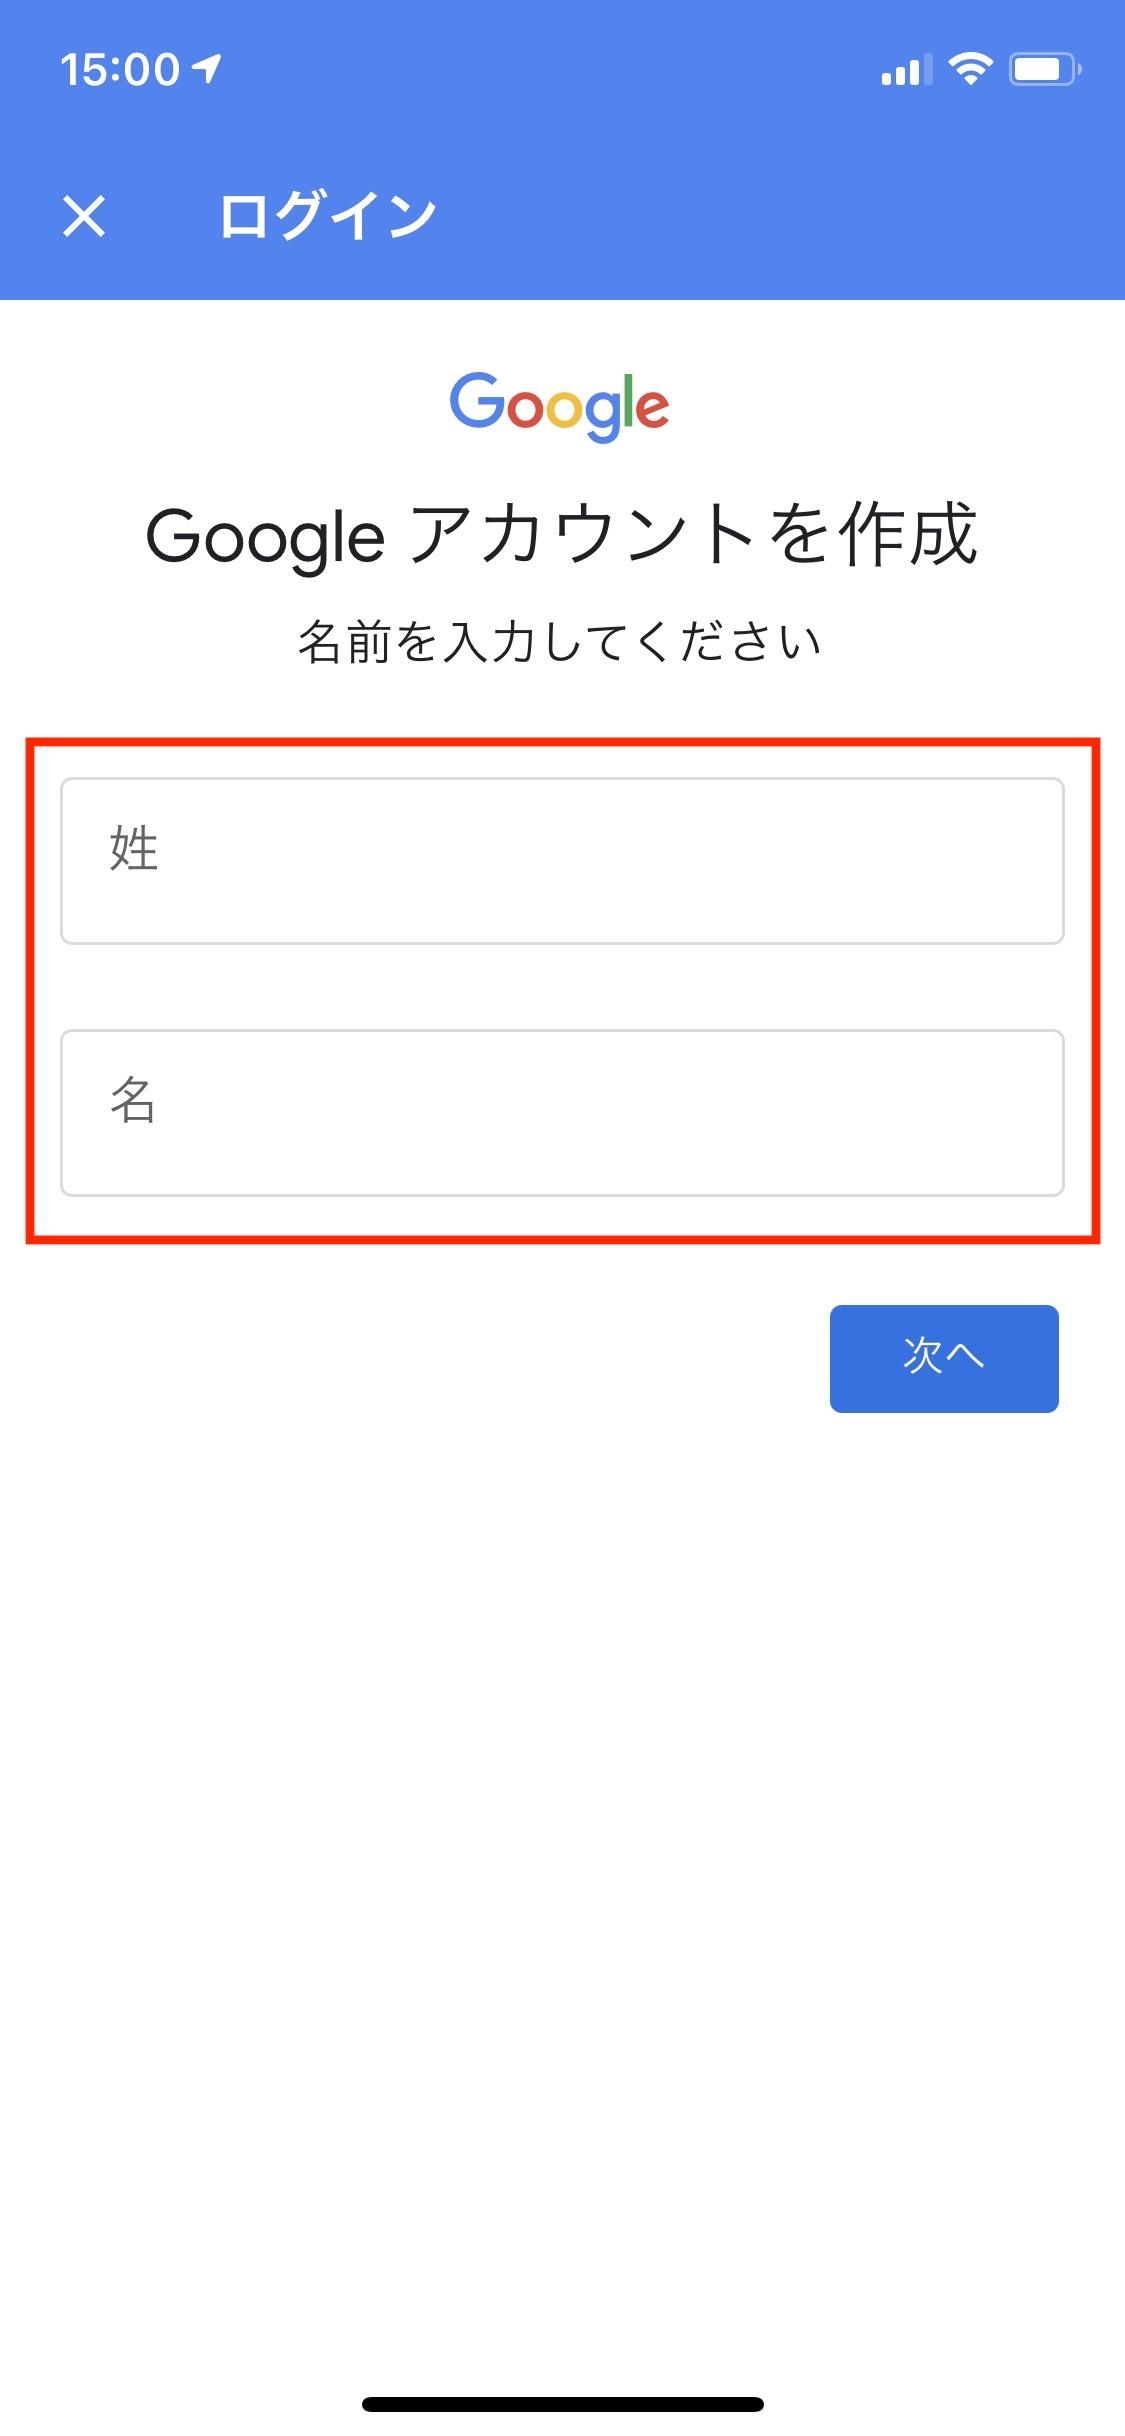 GoogleChromeで『自分用』か『ビジネスの管理用』をタップした後の画面